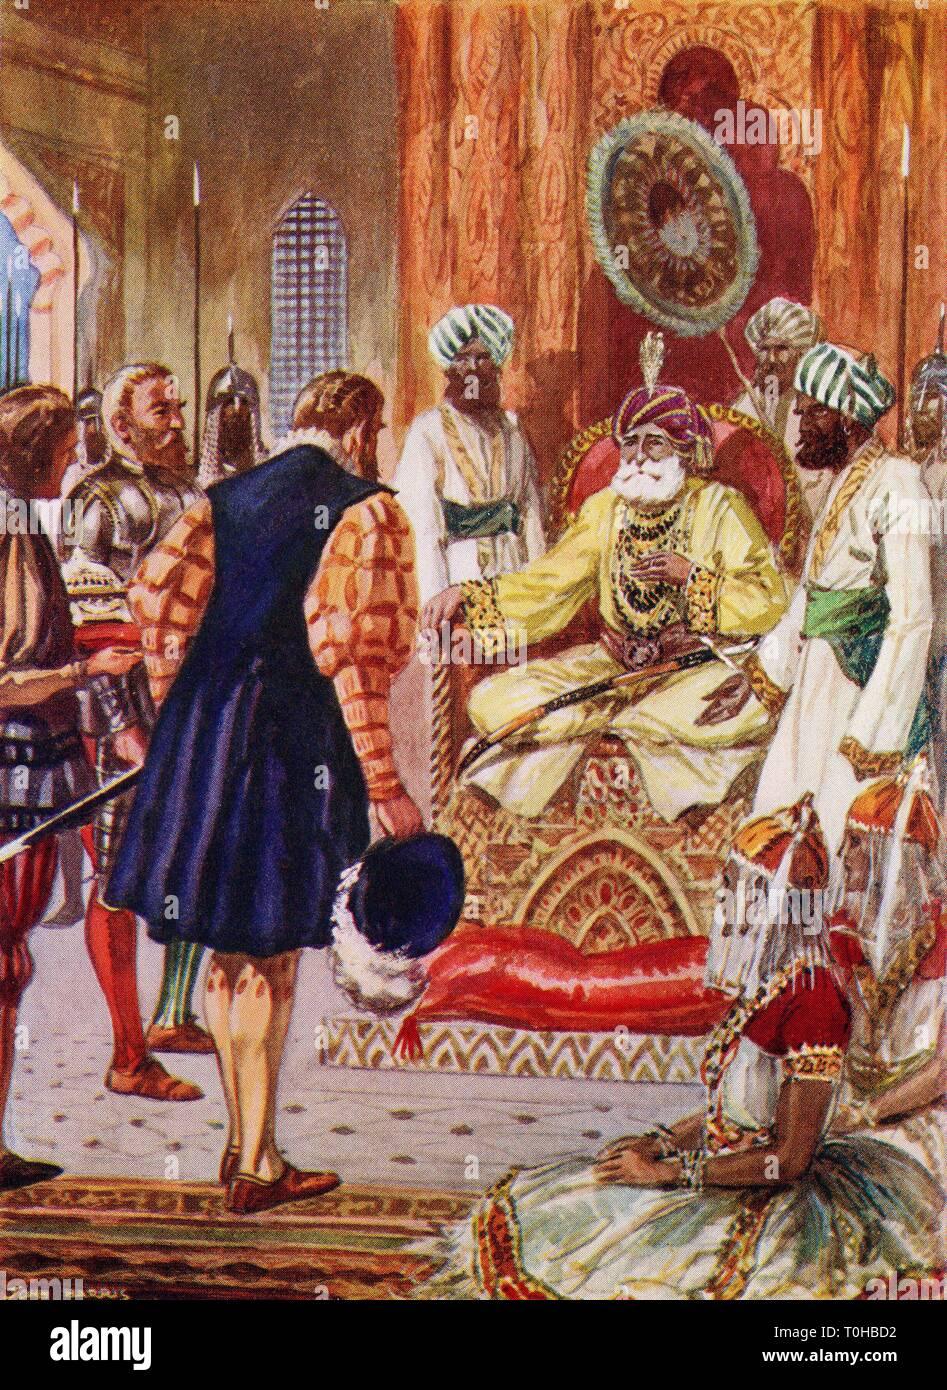 Vasco Da Gama visiting the Rajah of Cannanore, India, 1498 - Stock Image